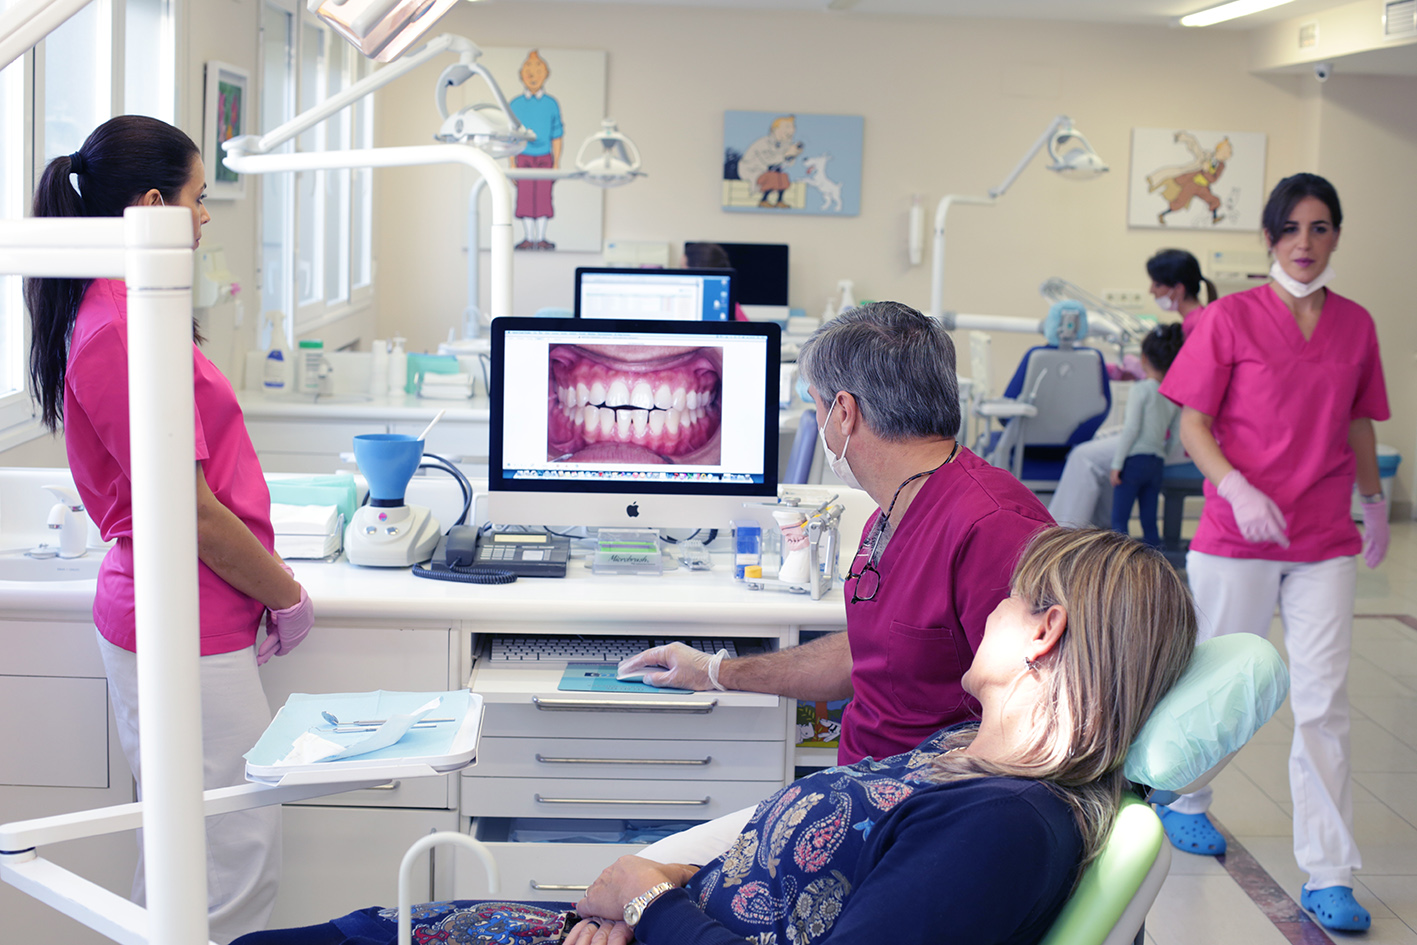 Tratamento ortodoncia a paciente